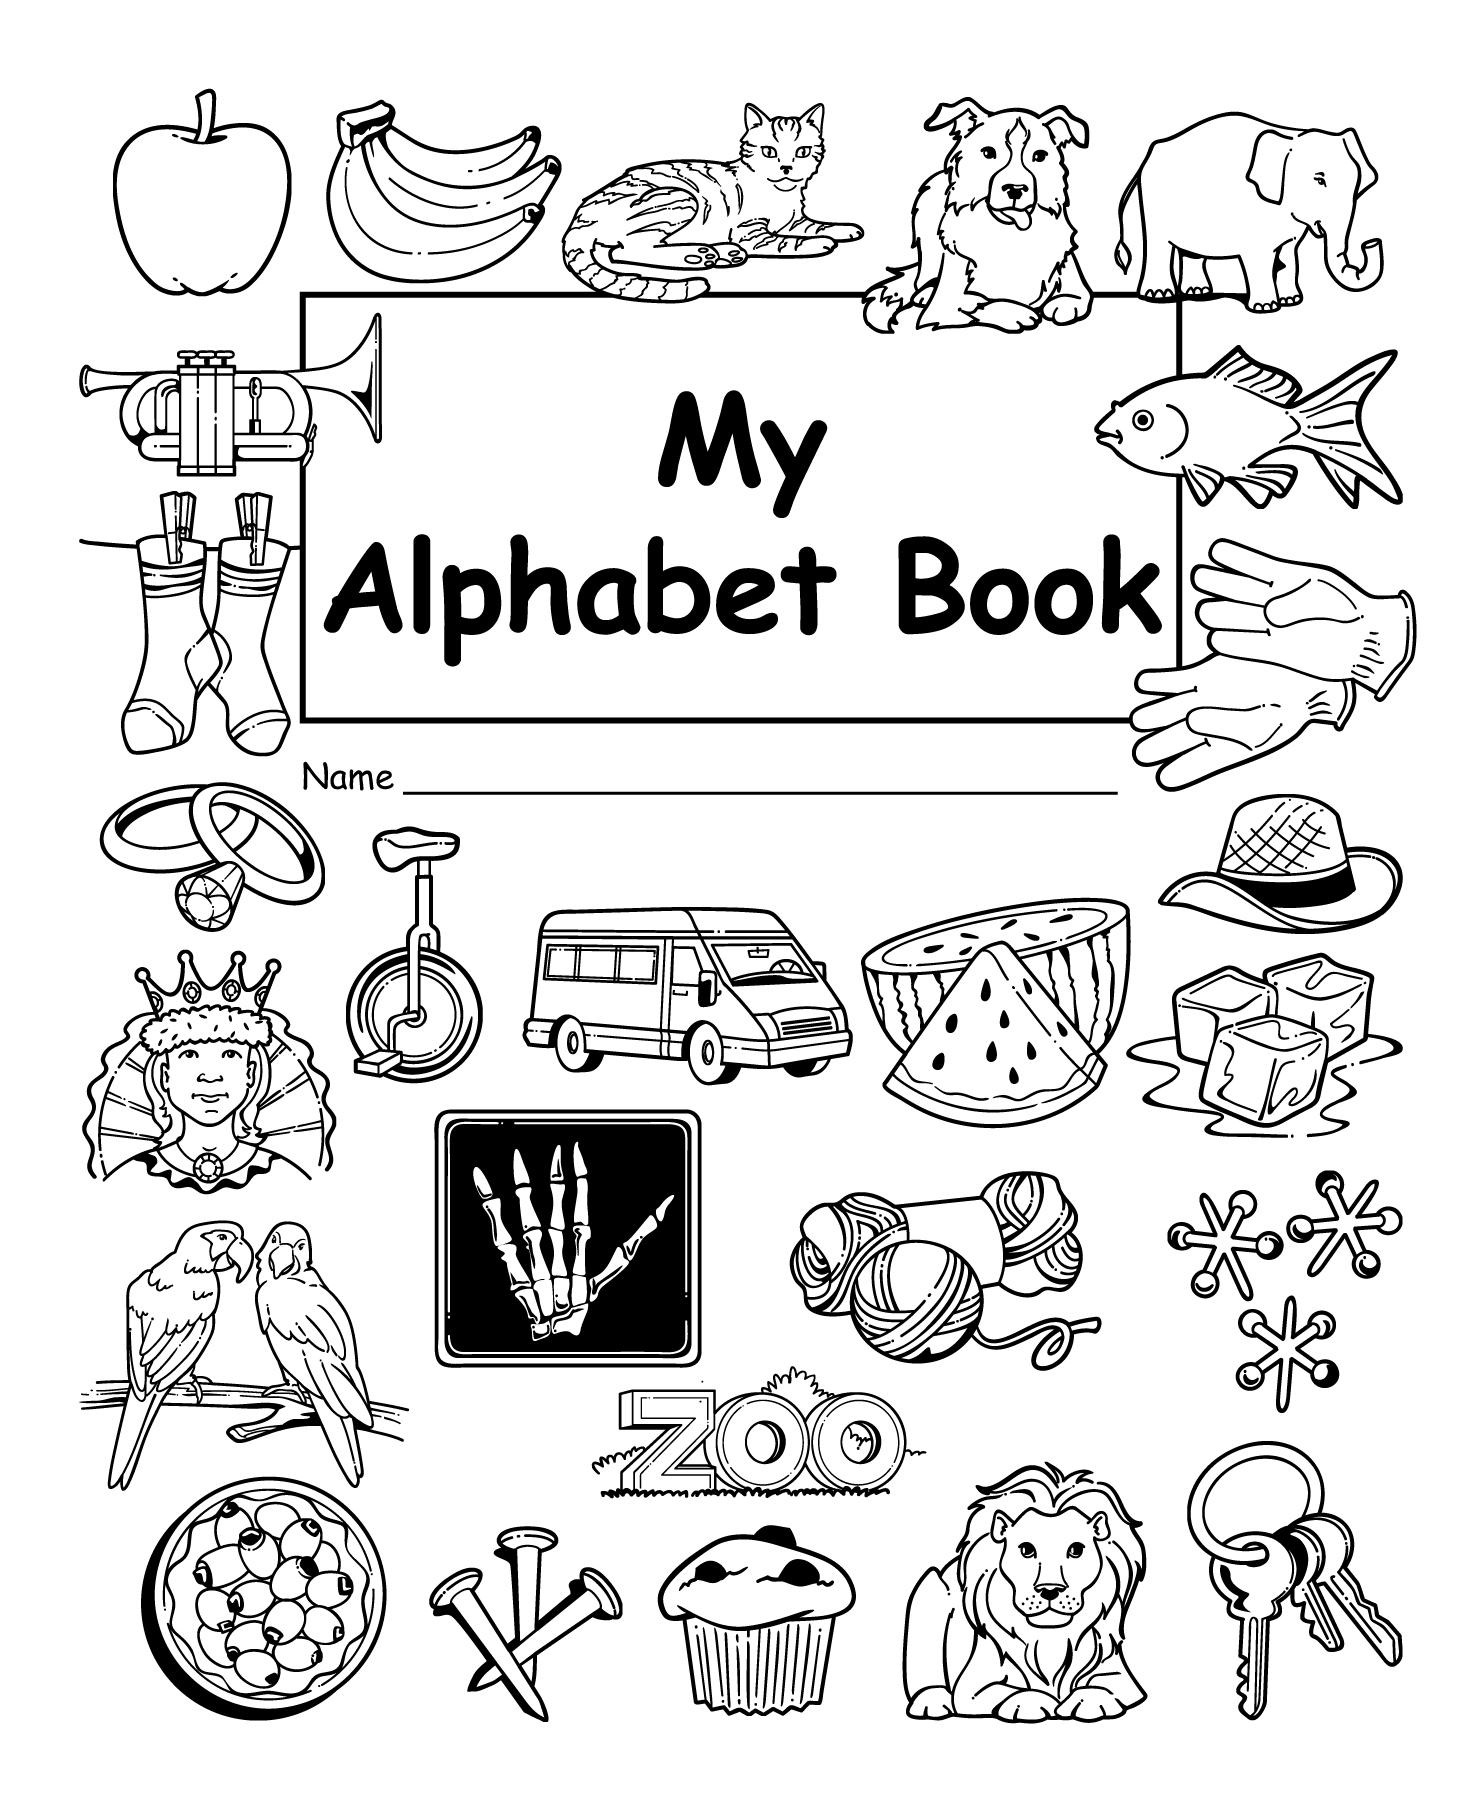 My Own Alphabet Book 10 Pack